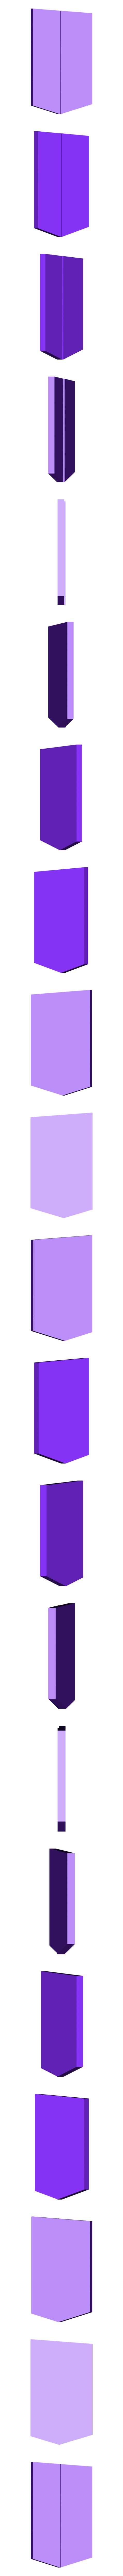 Table_leg_01.stl Download free STL file Metaphor • 3D printing template, JayOmega